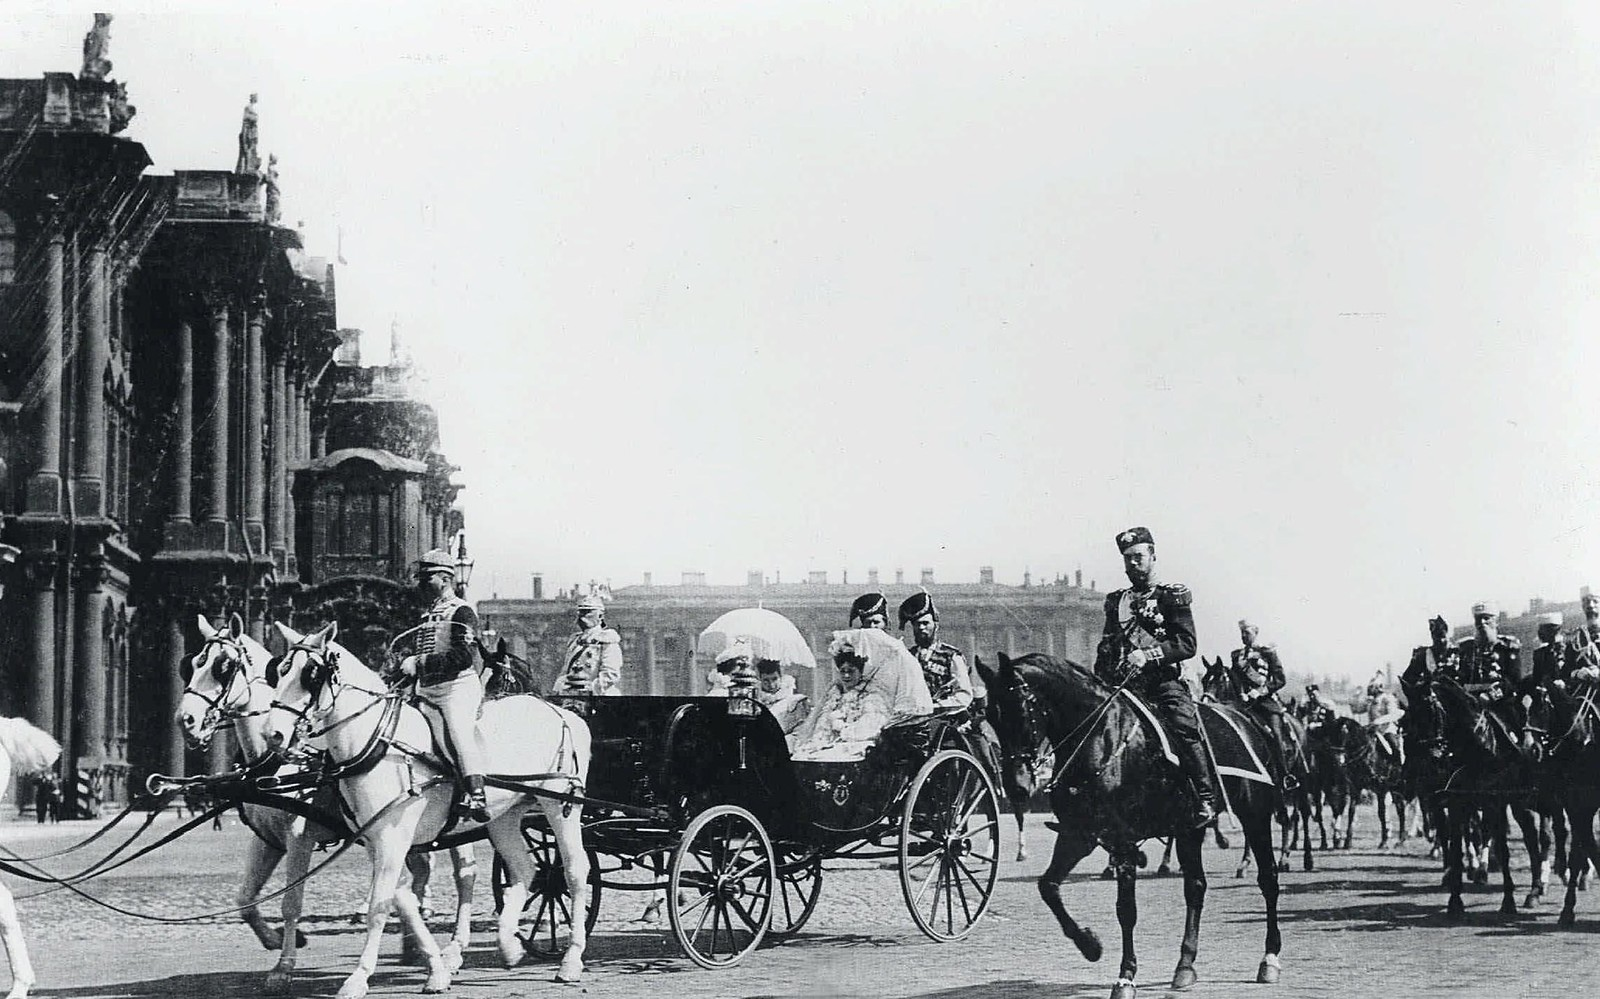 1901. Николай II, императрица Мария Федоровна и Александра Федоровна. Майский парад